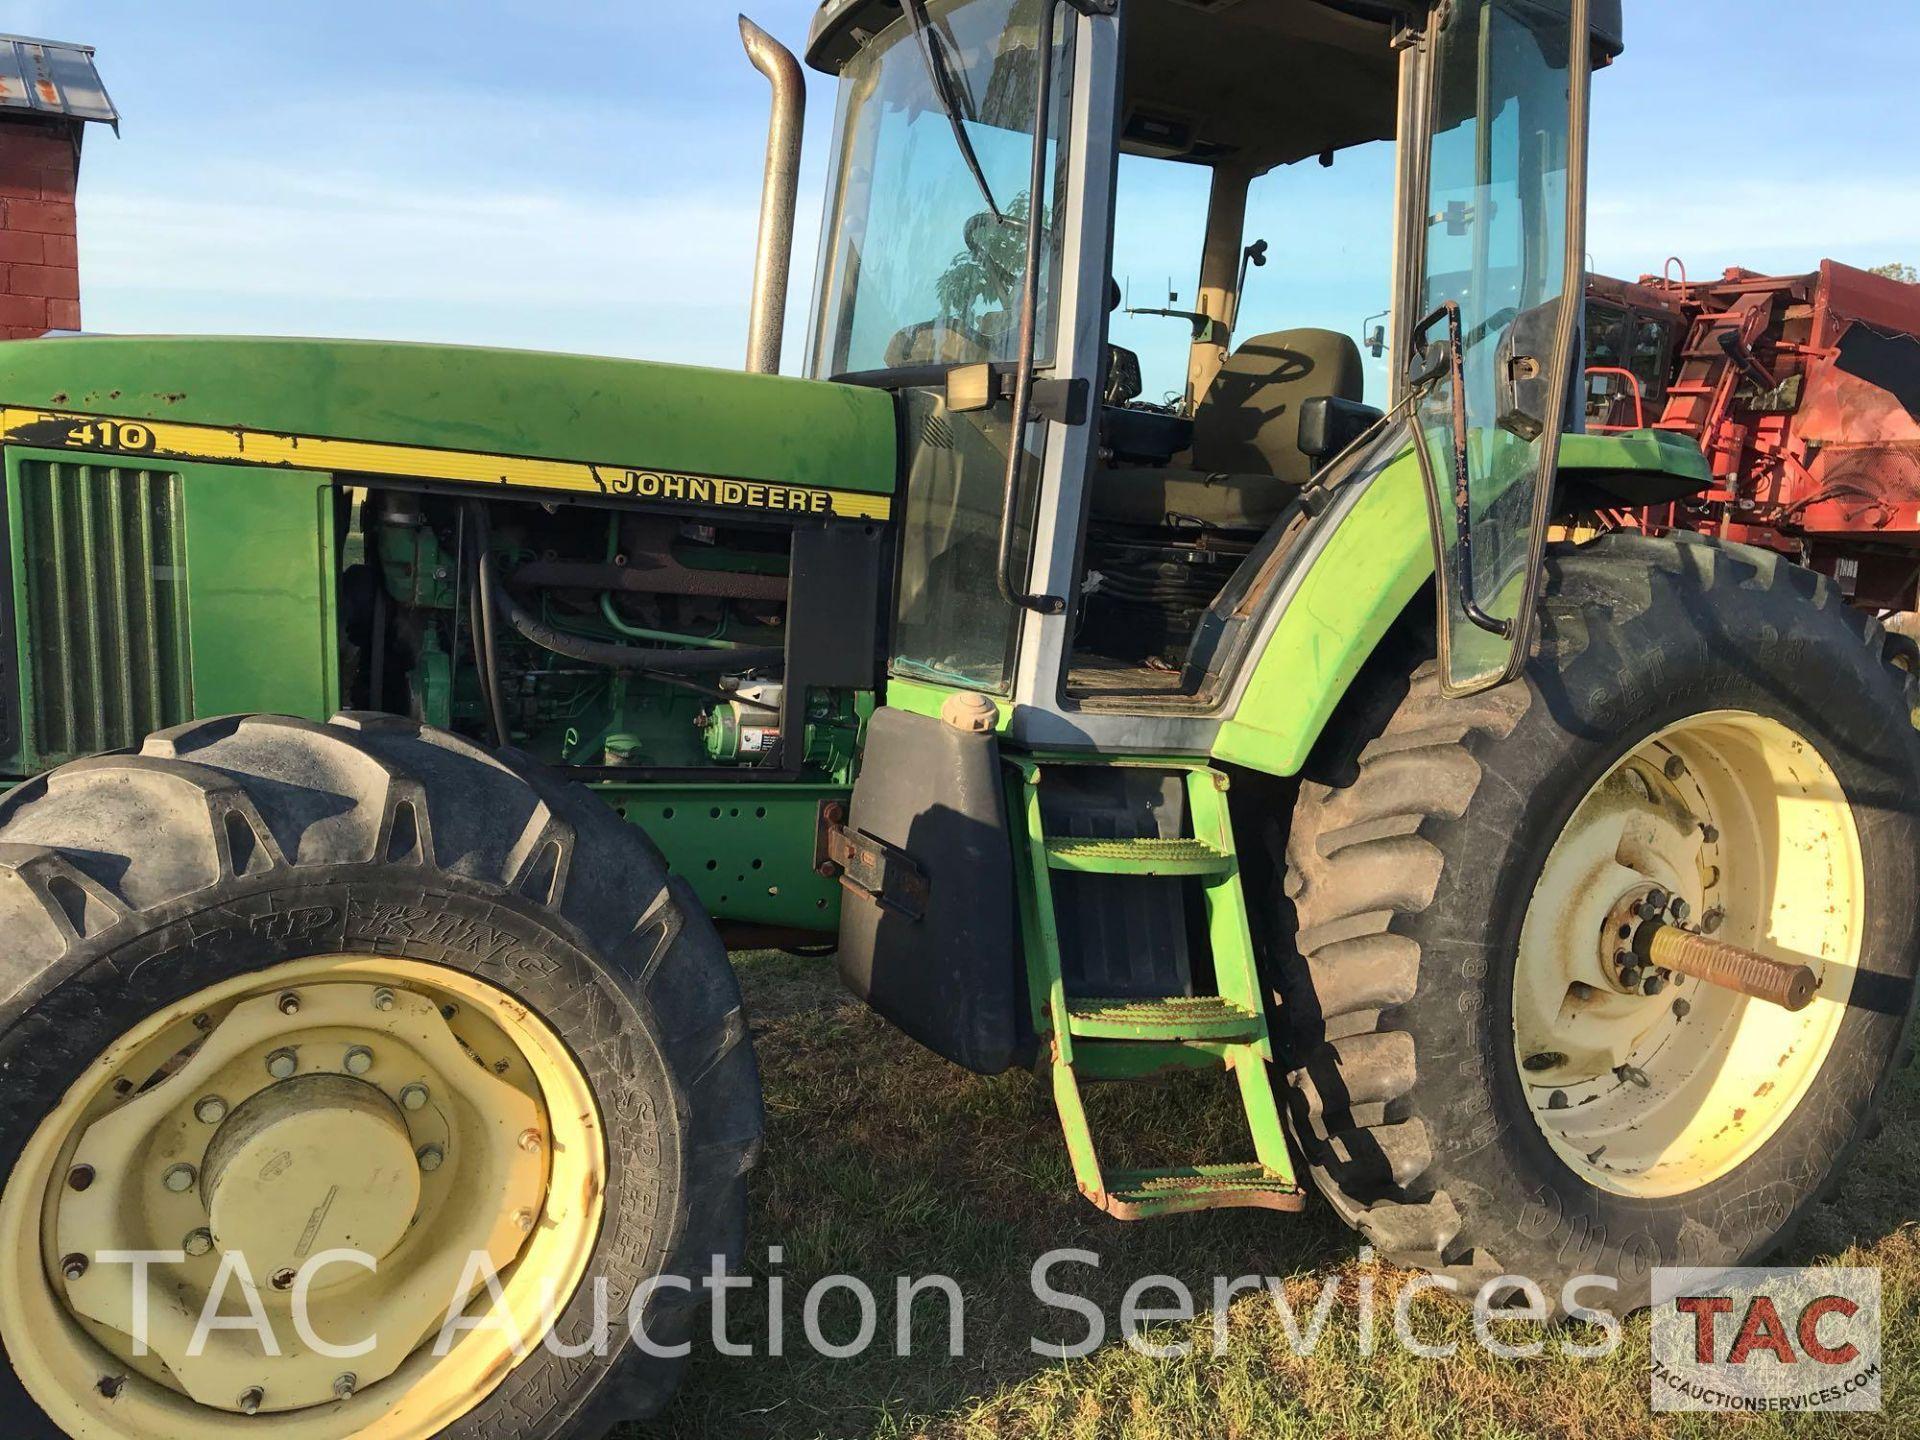 John Deere 7410 Farm Tractor - Image 4 of 24